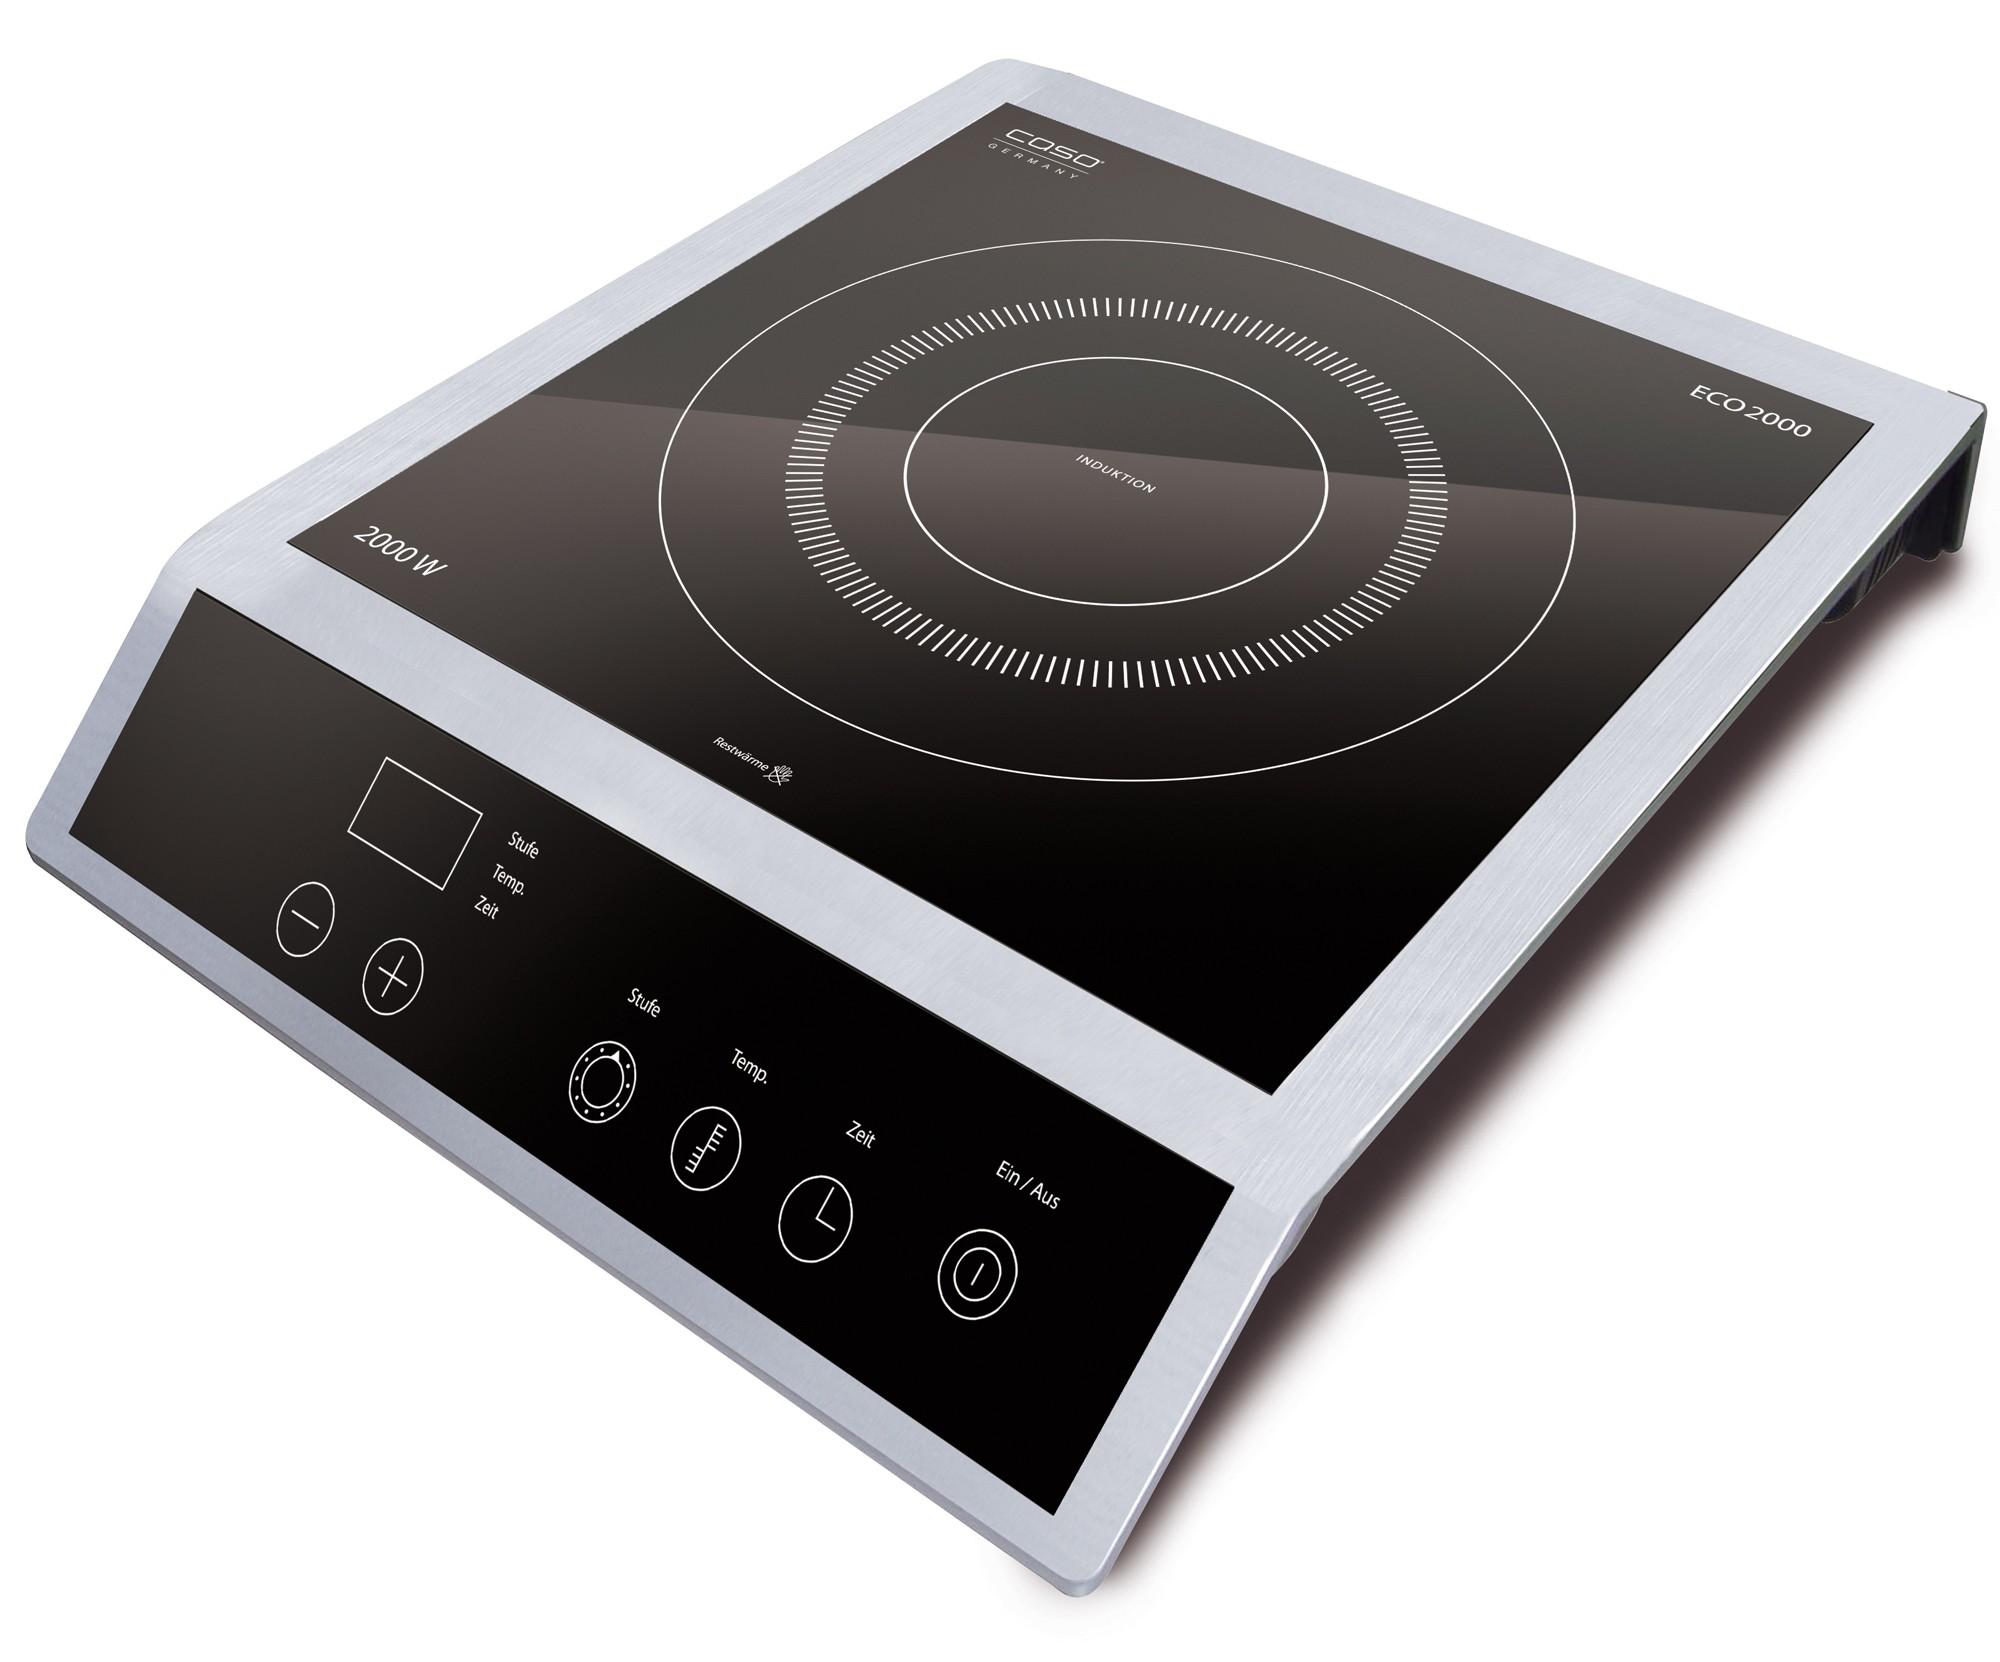 Caso design induktionskochfeld eco 2000 homeelectric for Induktionsherdplatten